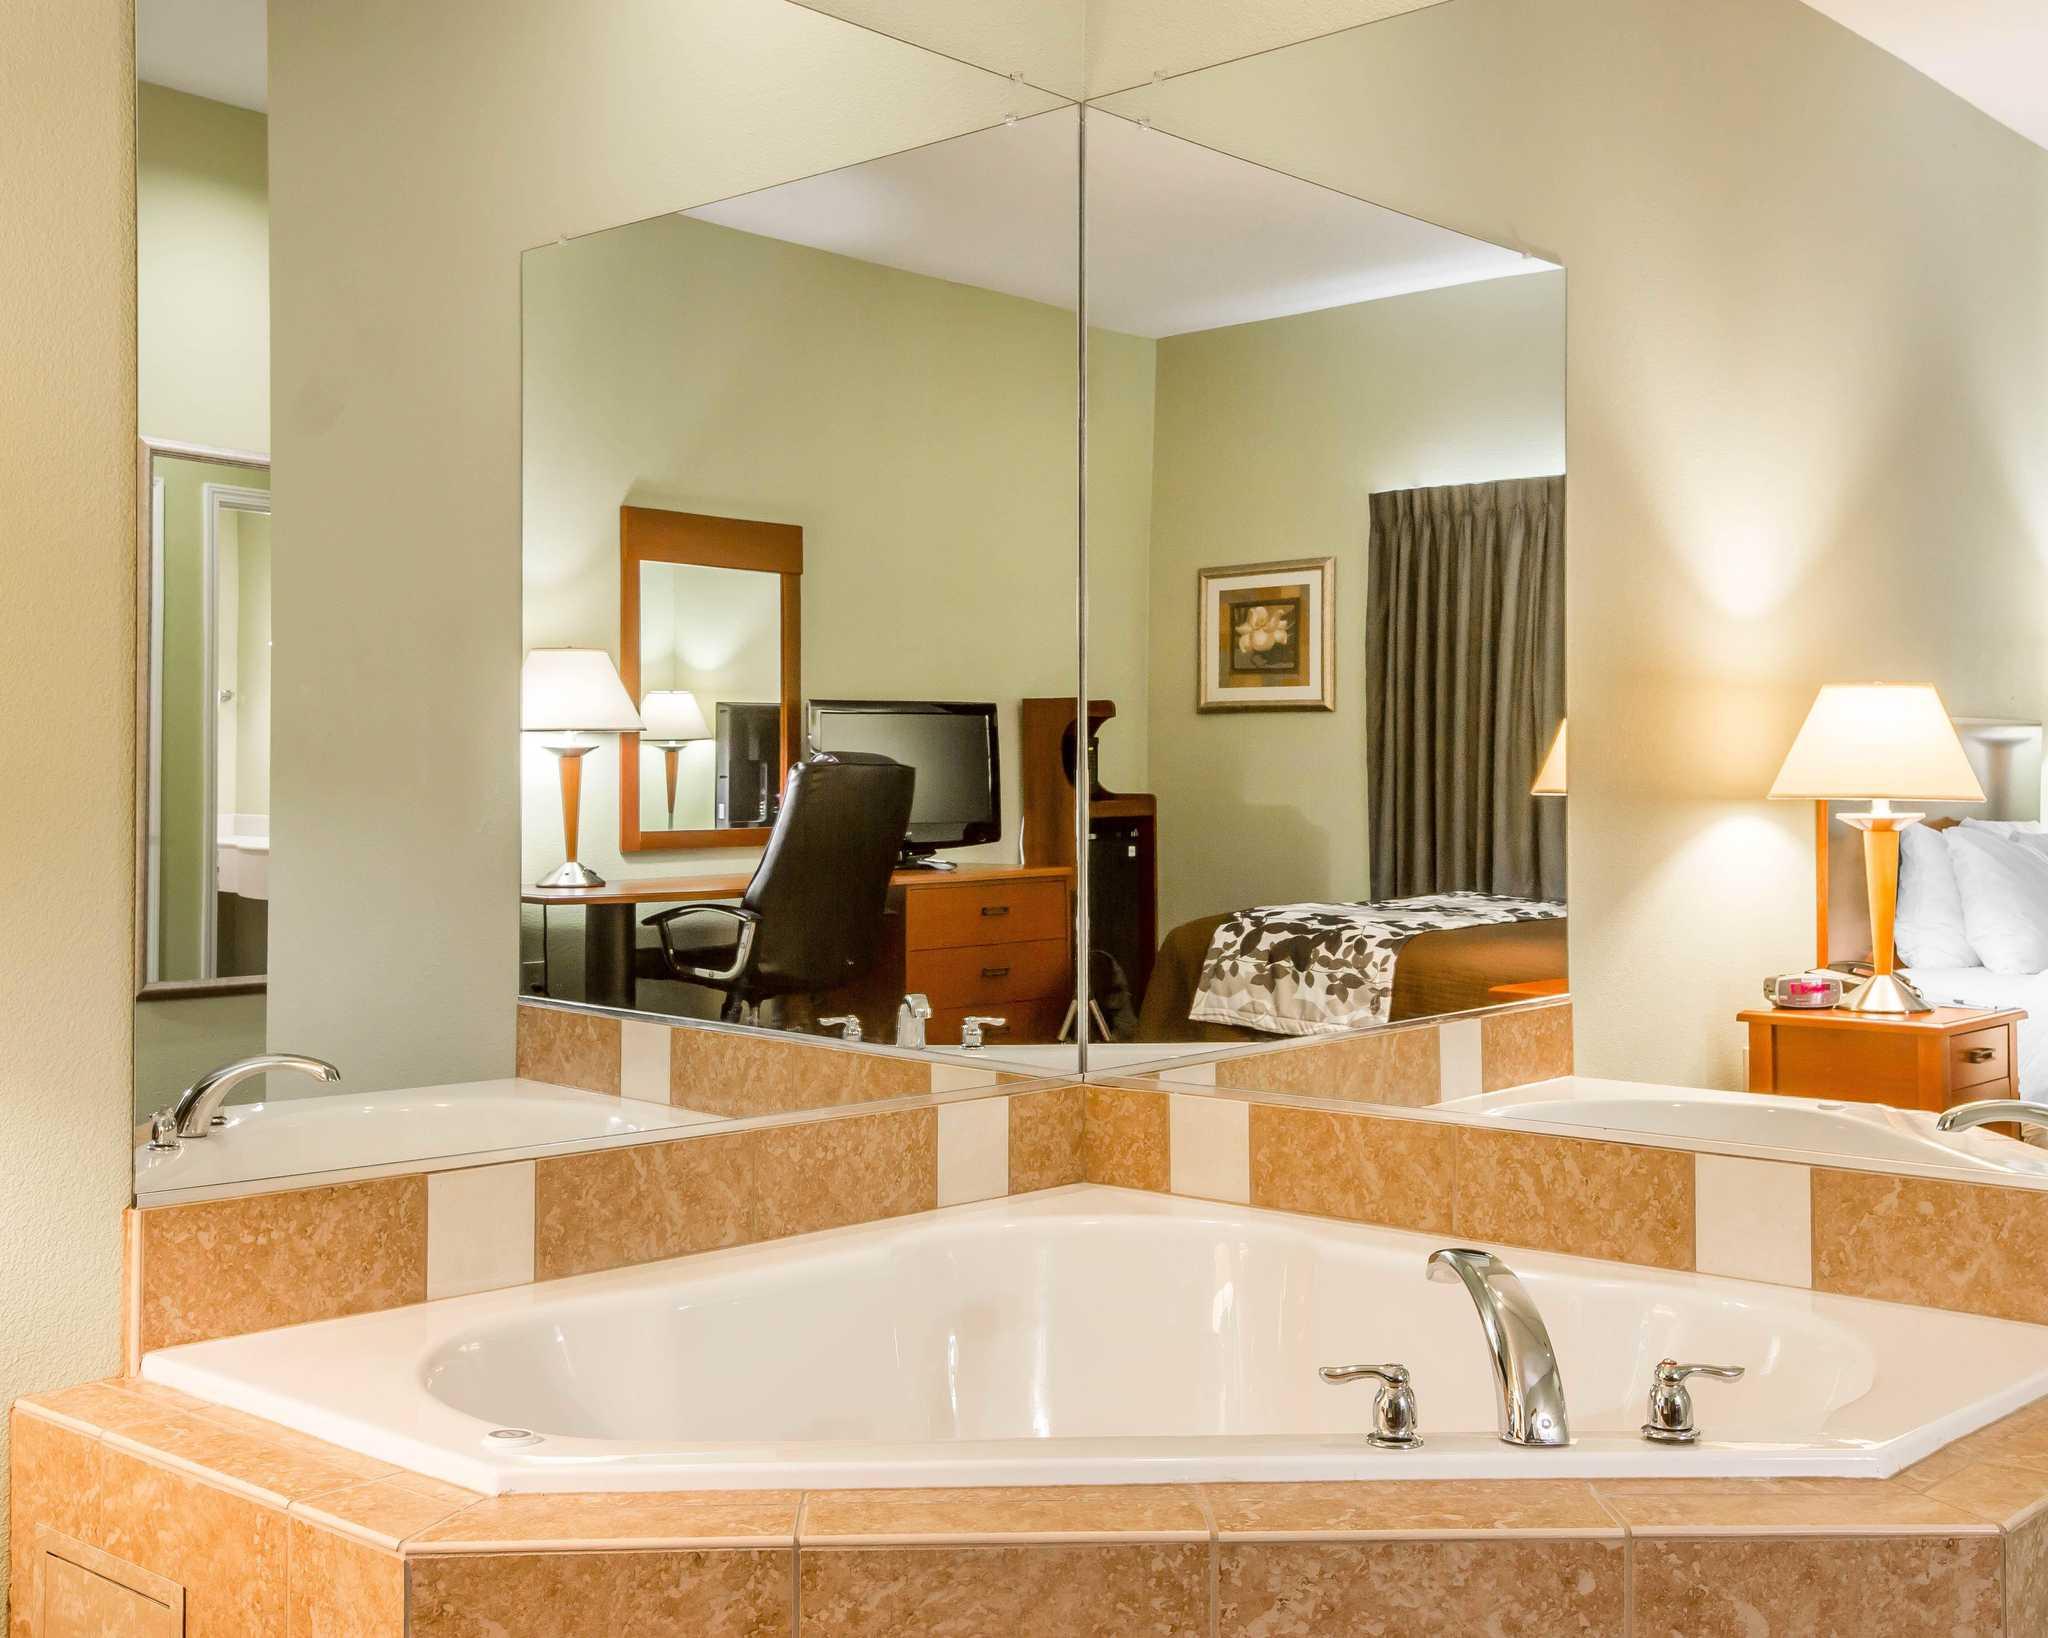 Sleep Inn Suites 181 Metromont Road Hiram Ga Hotels Motels Mapquest